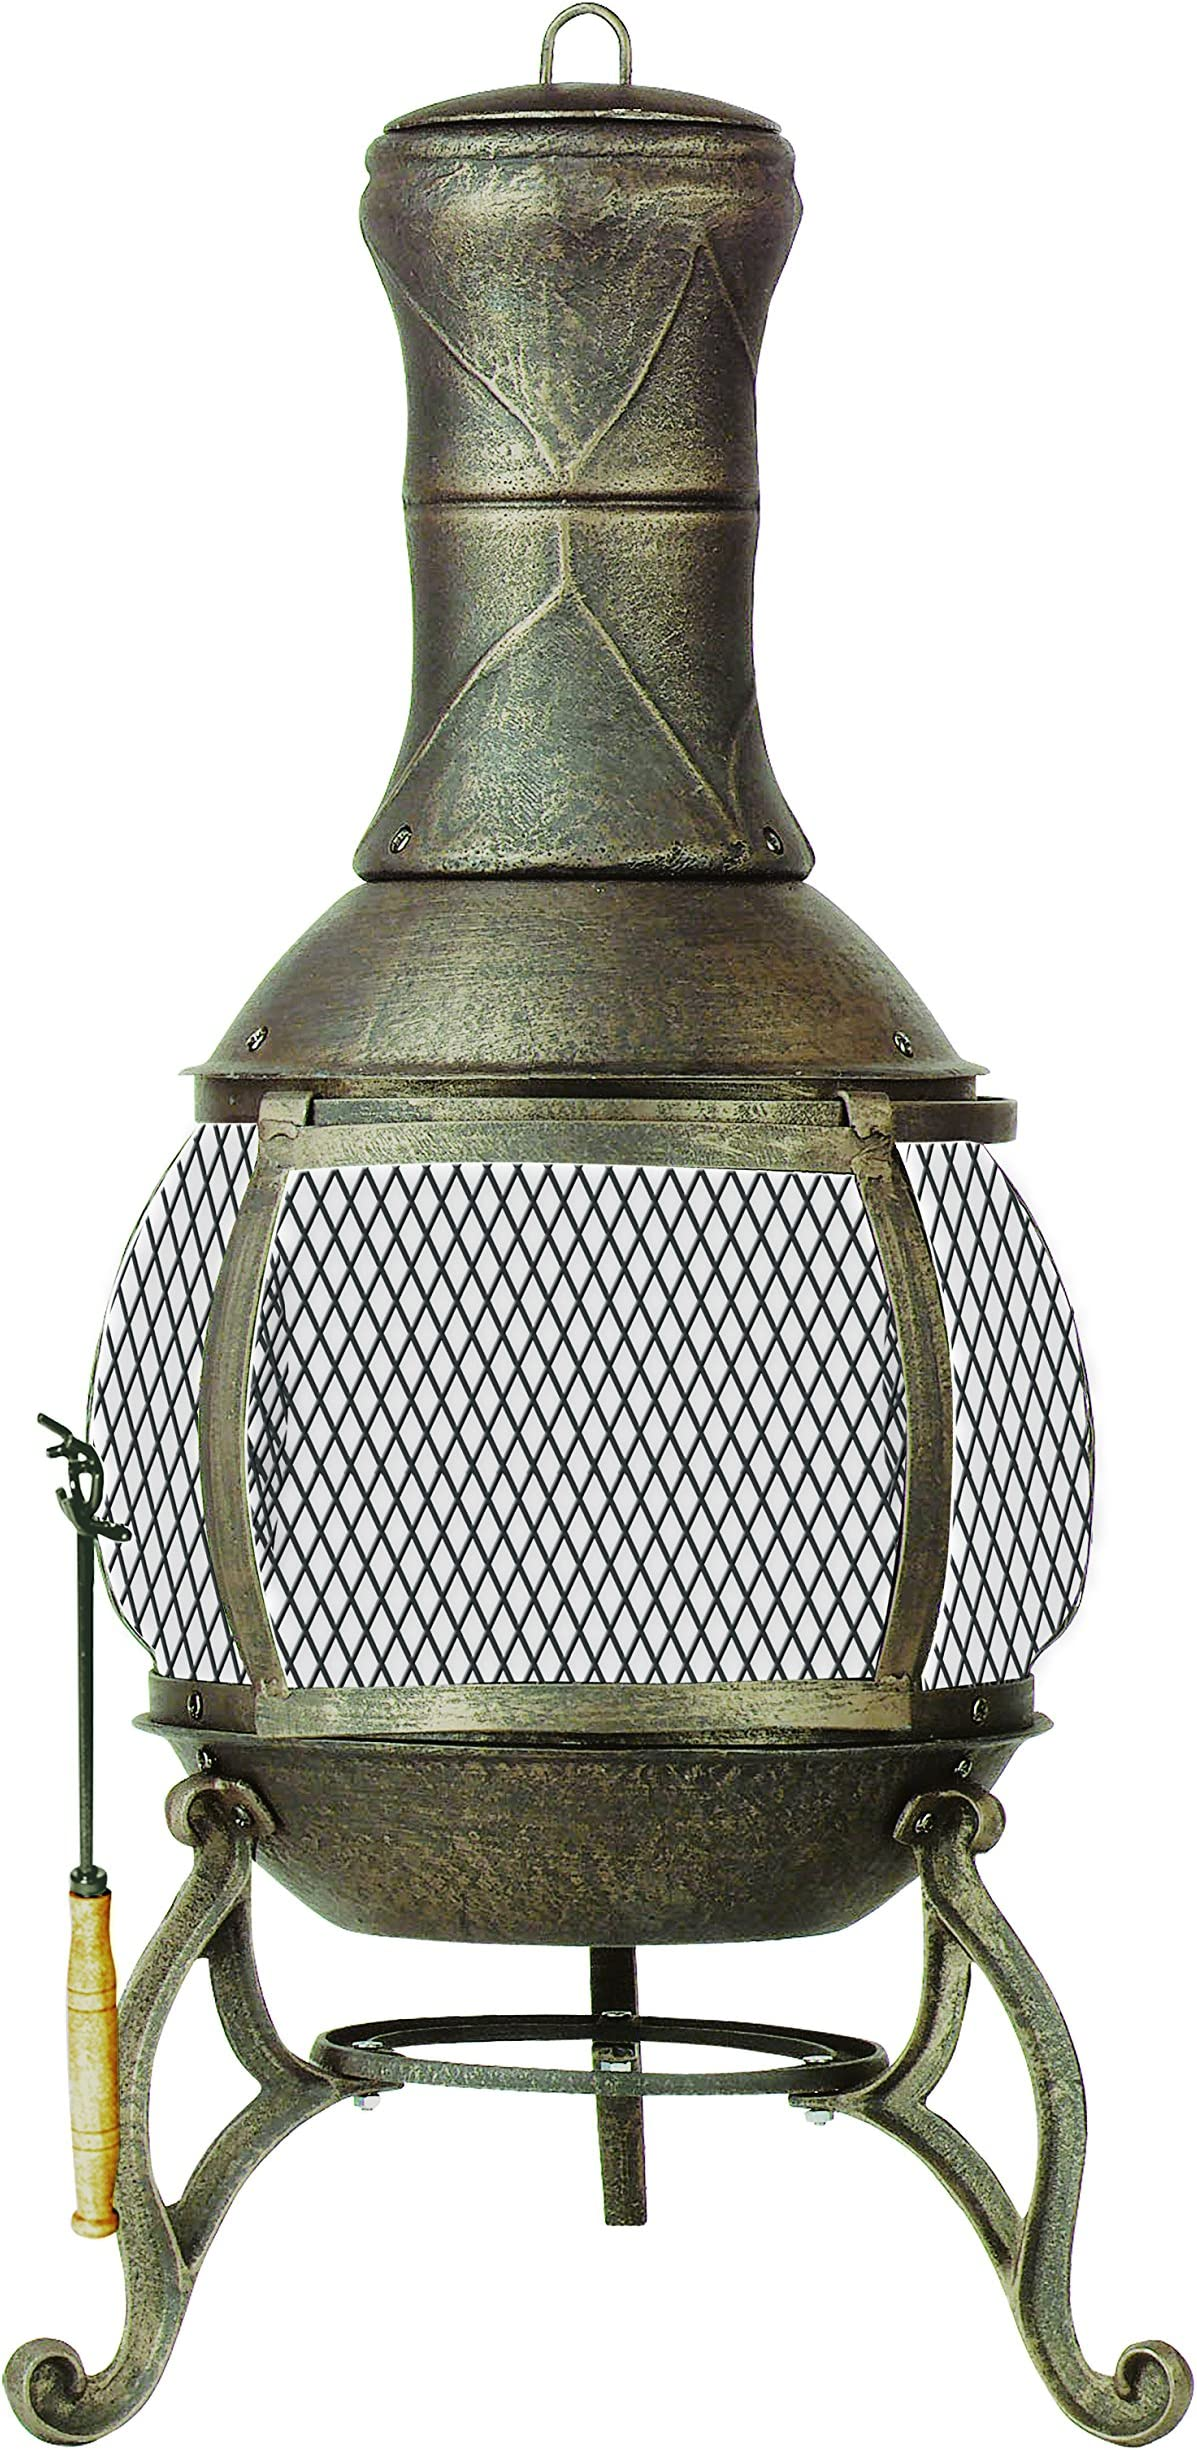 Deckmate Corona 3 Ft. High Outdoor Steel Chimenea Fireplace Model 28063